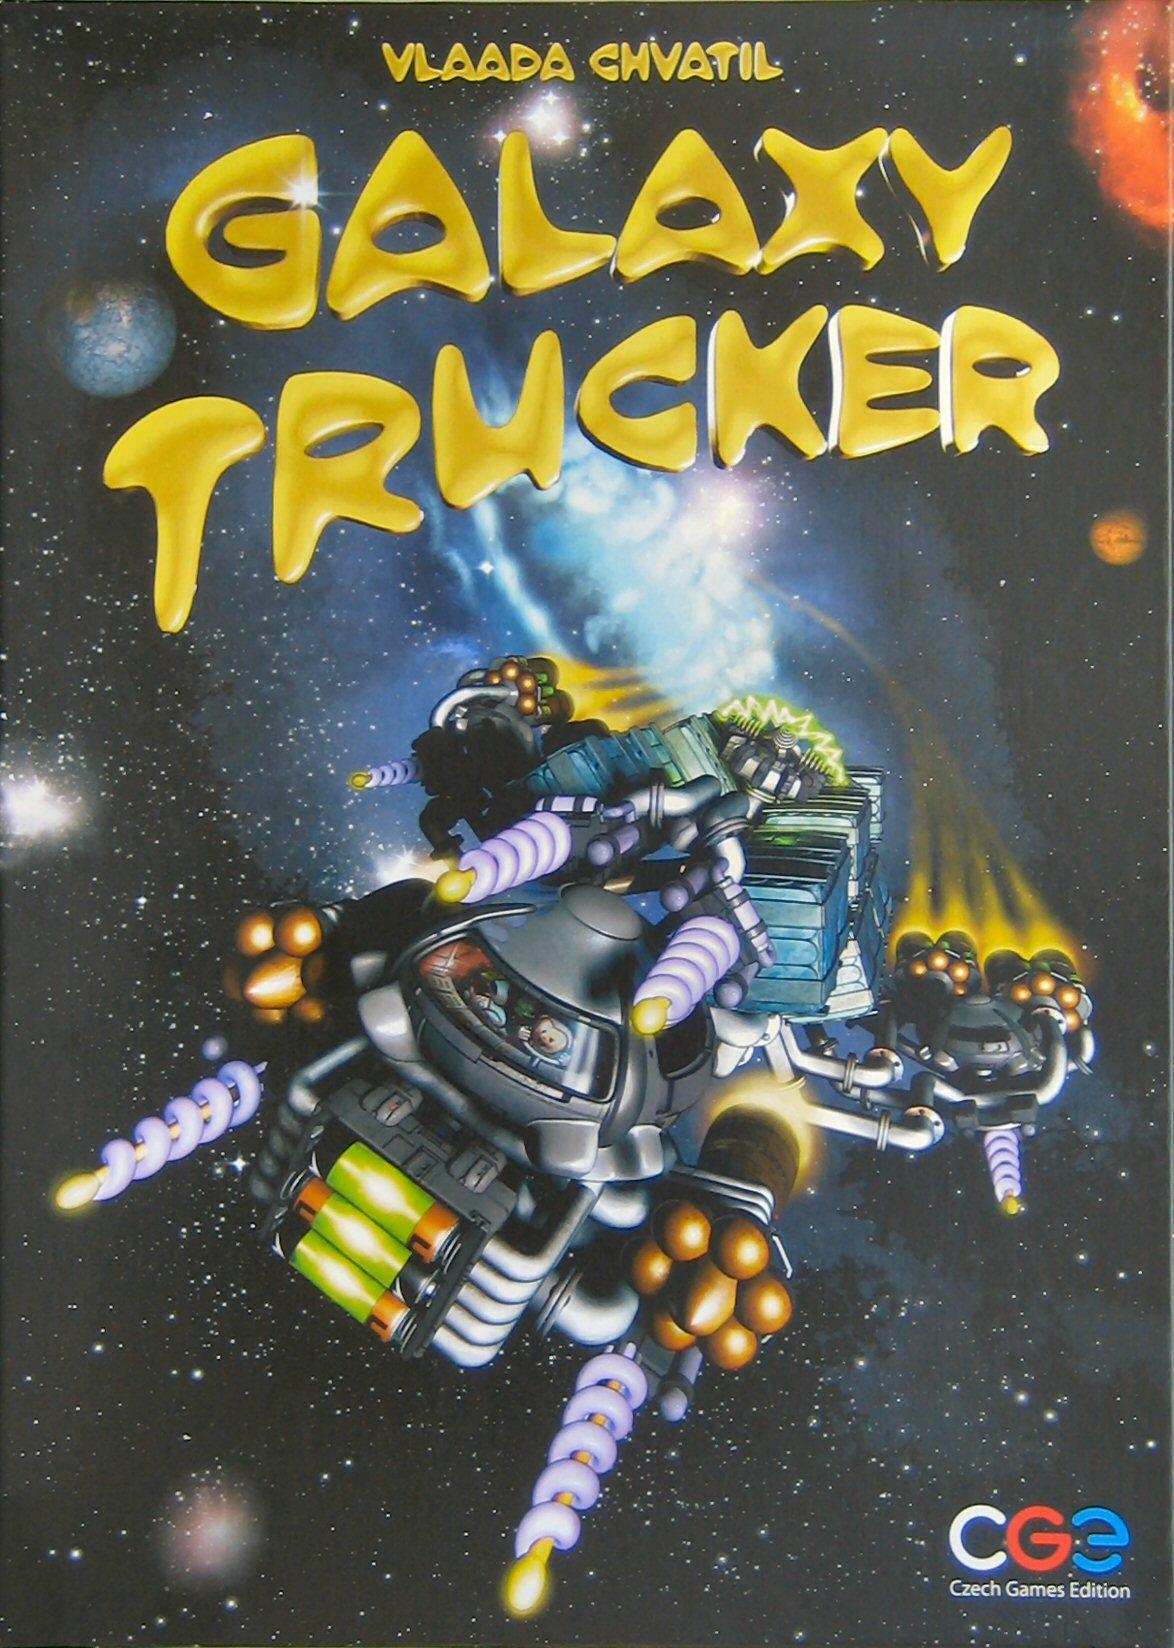 GALAXY TRUCKER AVENTURI IN SPATIU